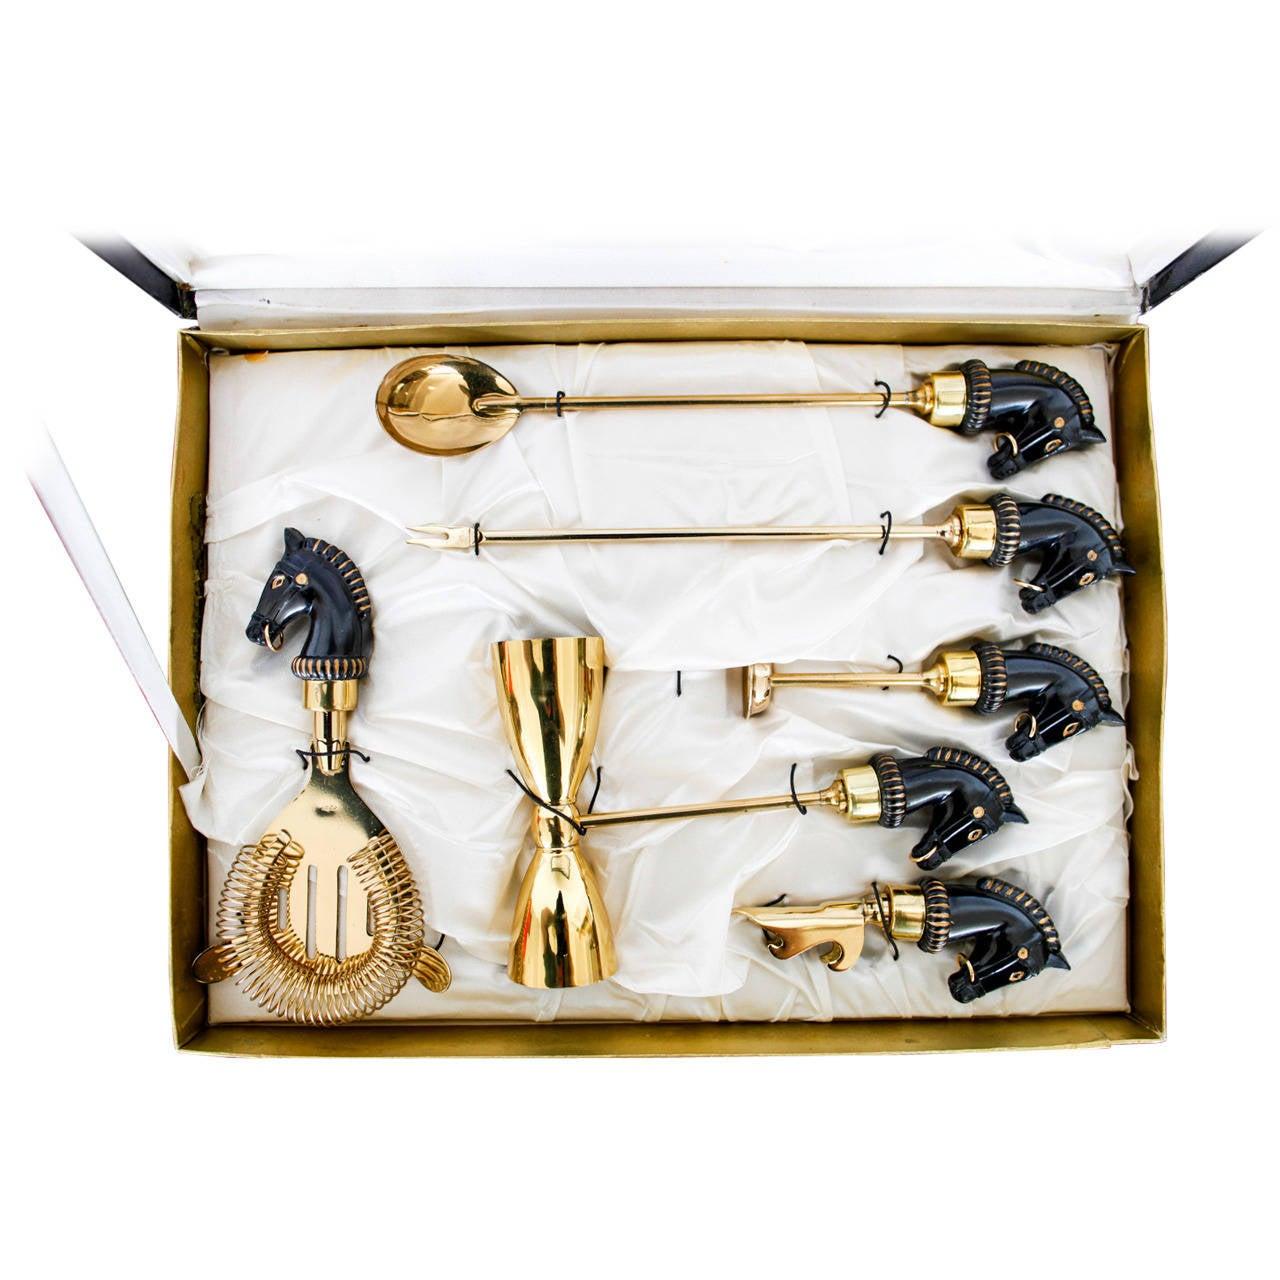 equestrian black and gold mid century barware set at 1stdibs